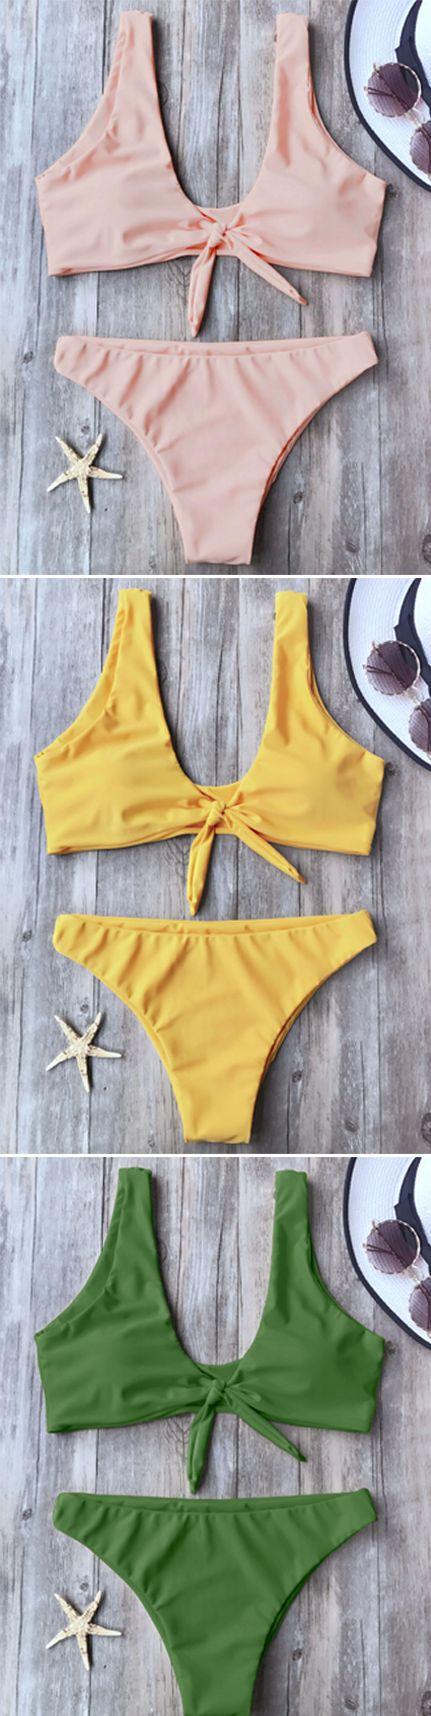 25 Best Ideas About Women Bathing Suits On Pinterest